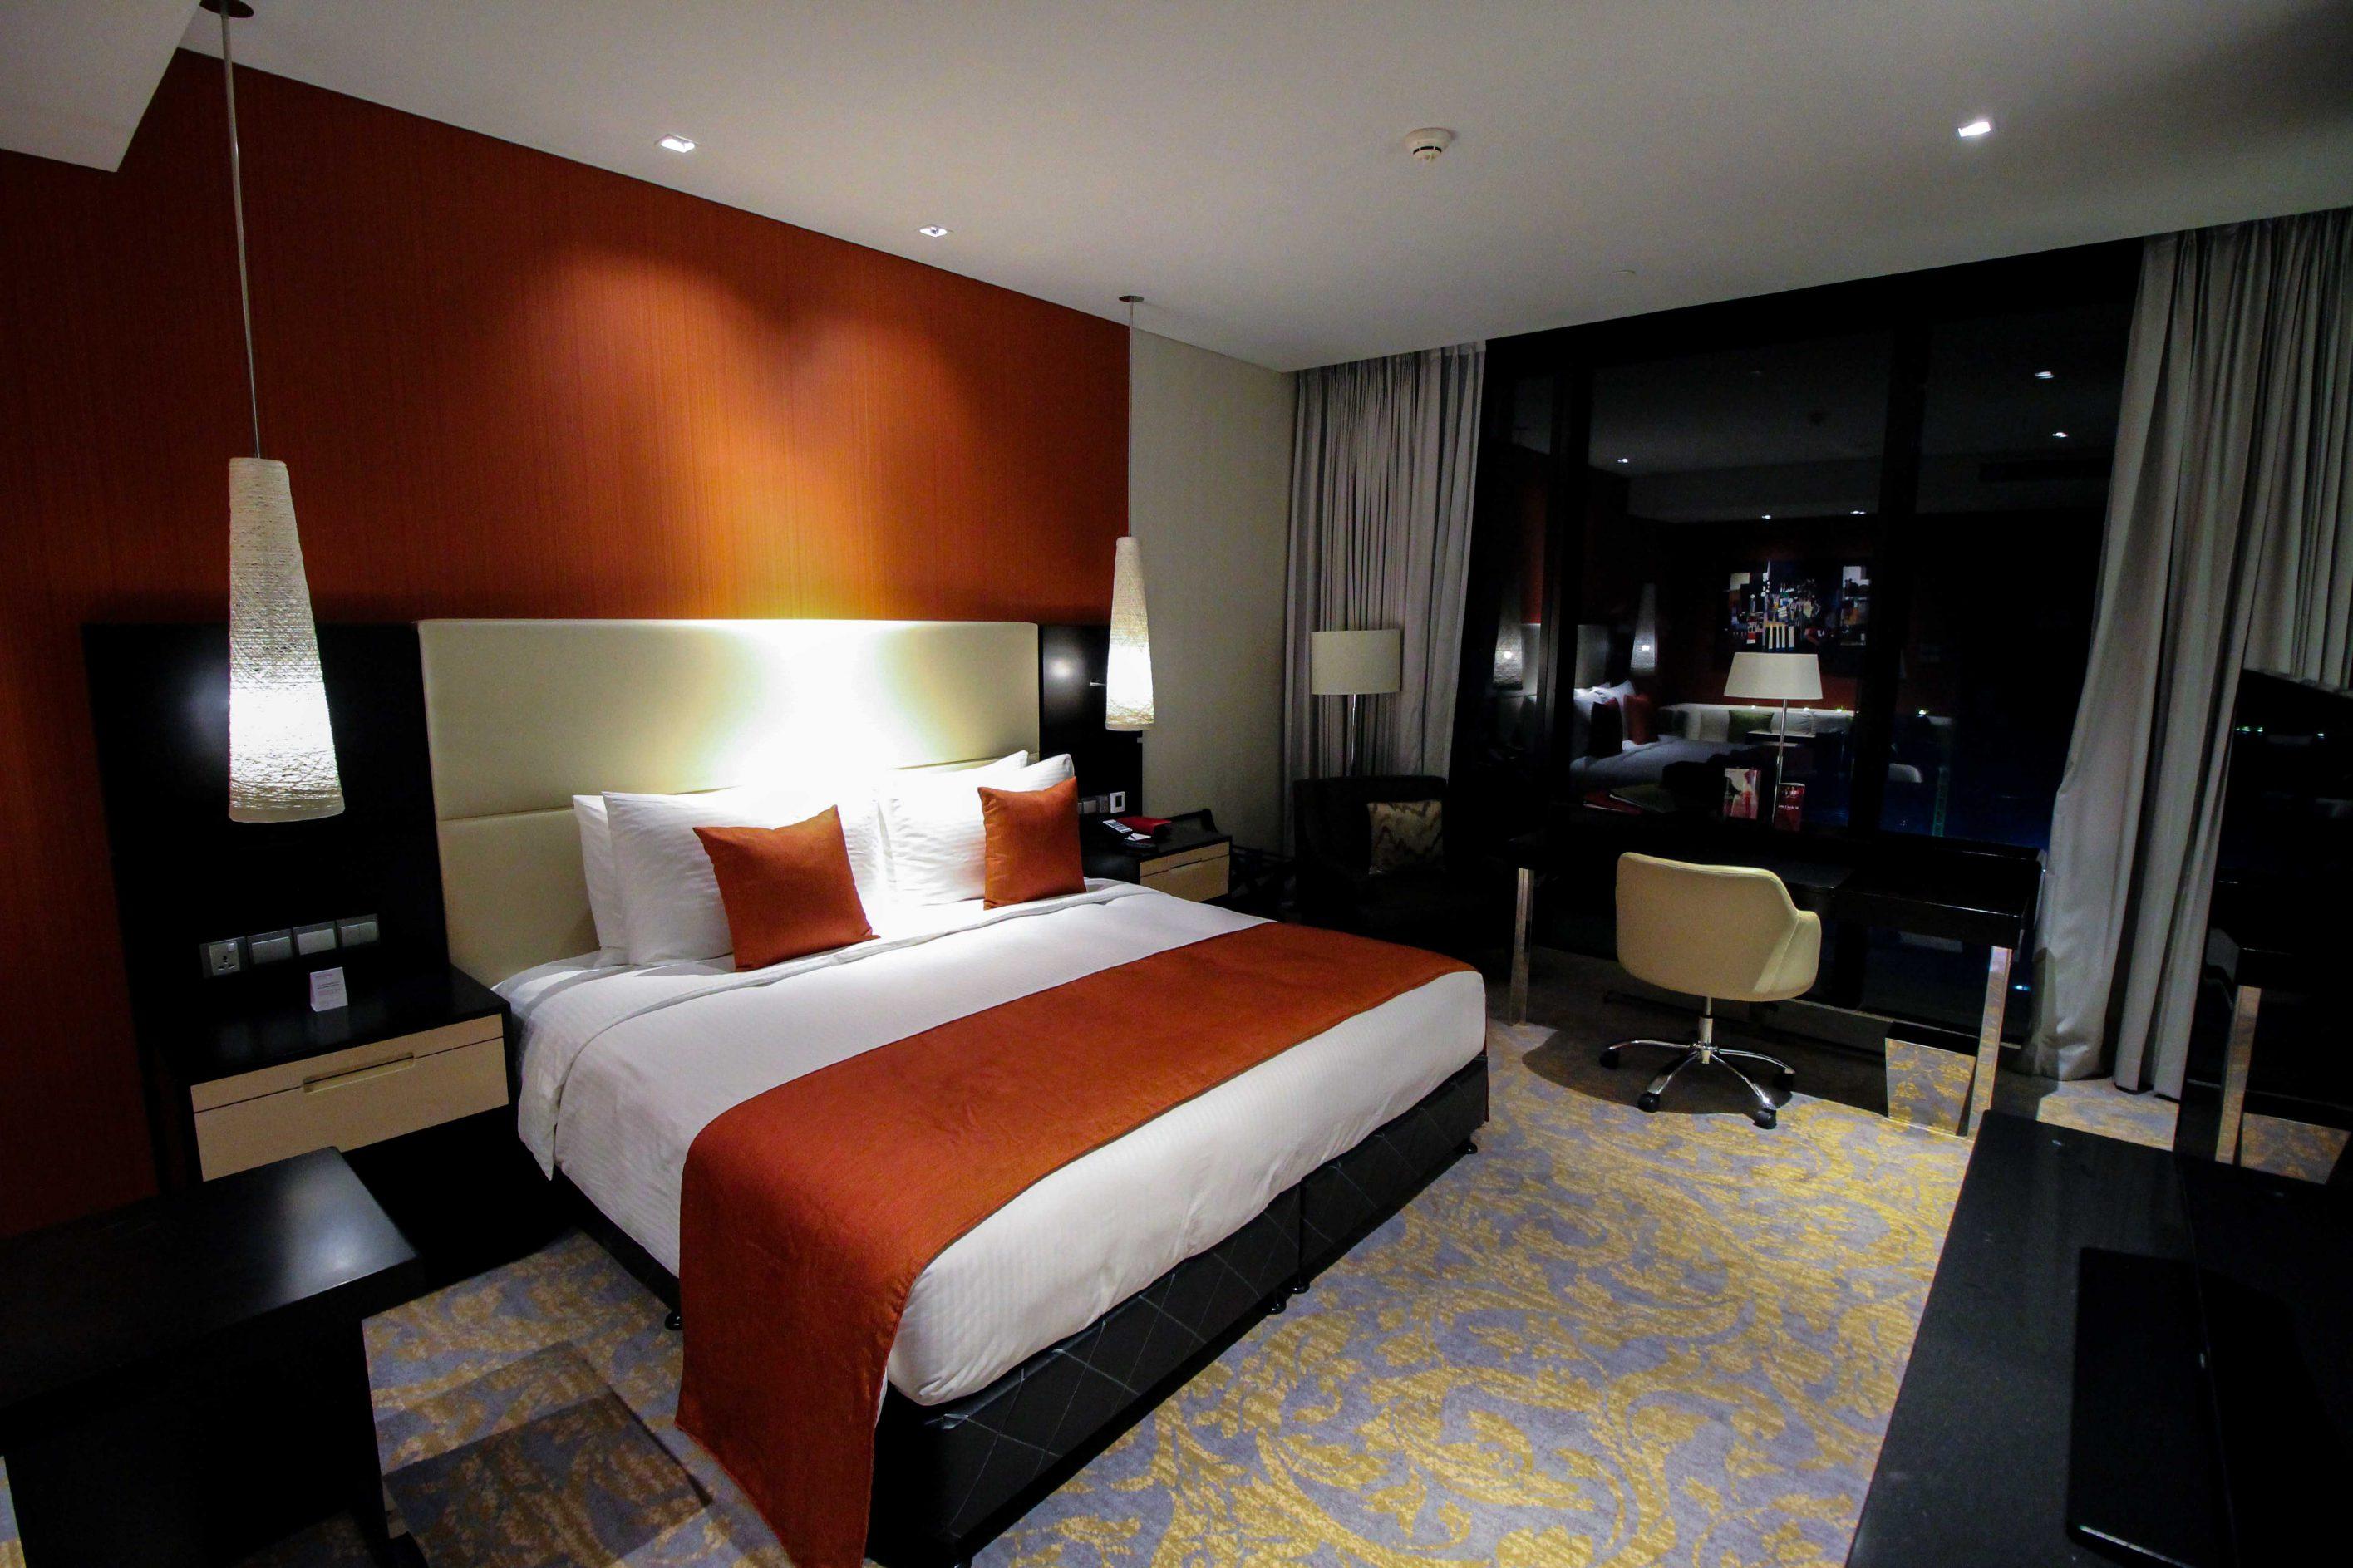 Mövenpick Colombo Hotel Reiseblog Reisebericht Superior Zimmer King-Size Bett Meerblick Rundreise Sri Lanka